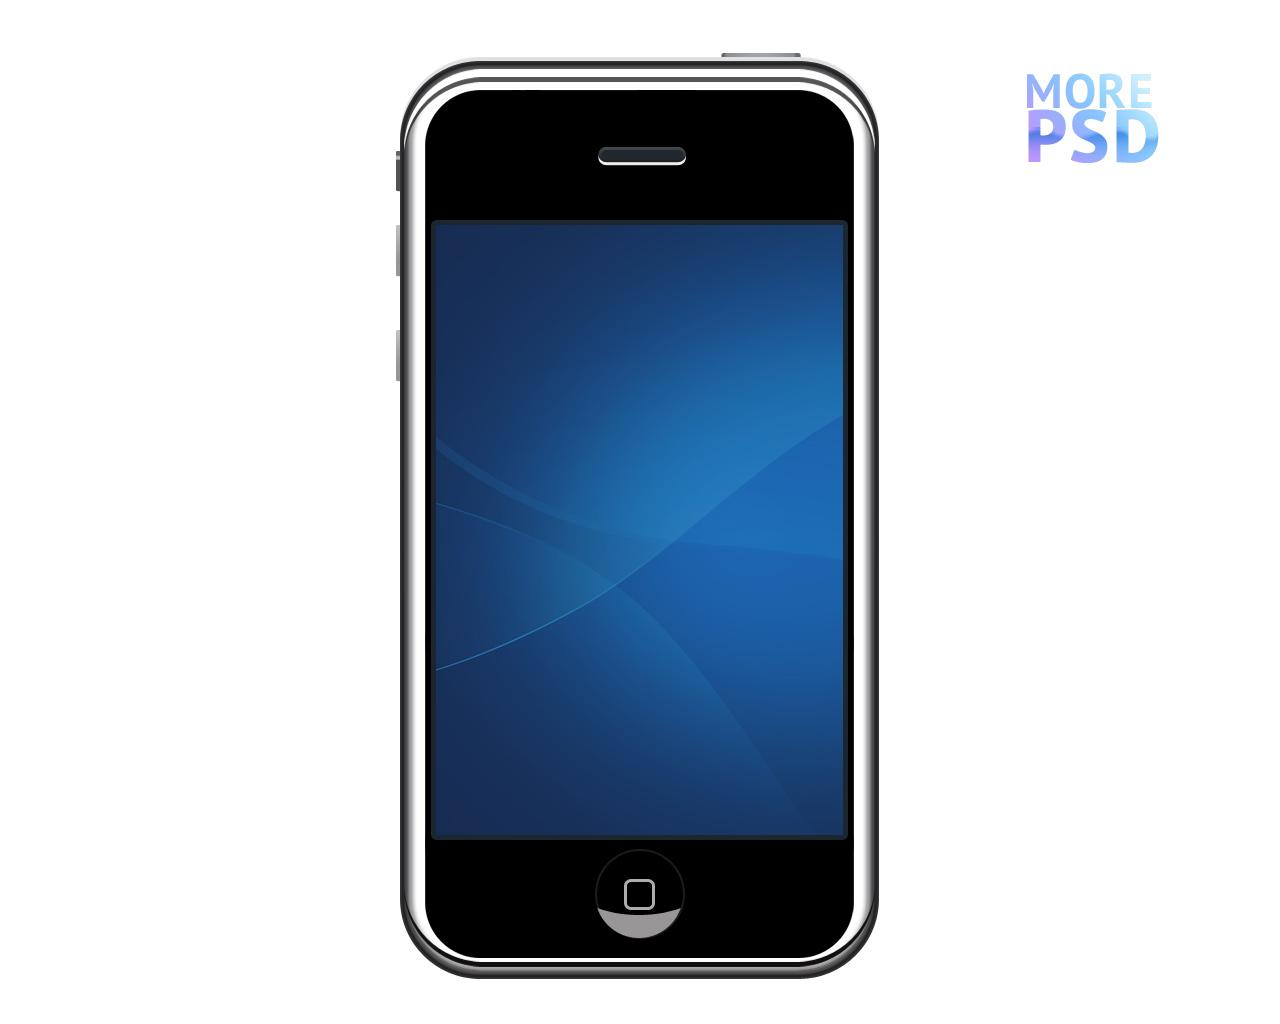 http://narod.ru/disk/38185009001/iphone-psd-format.rar.html: morepsd.ru/2012/01/iphone_psd